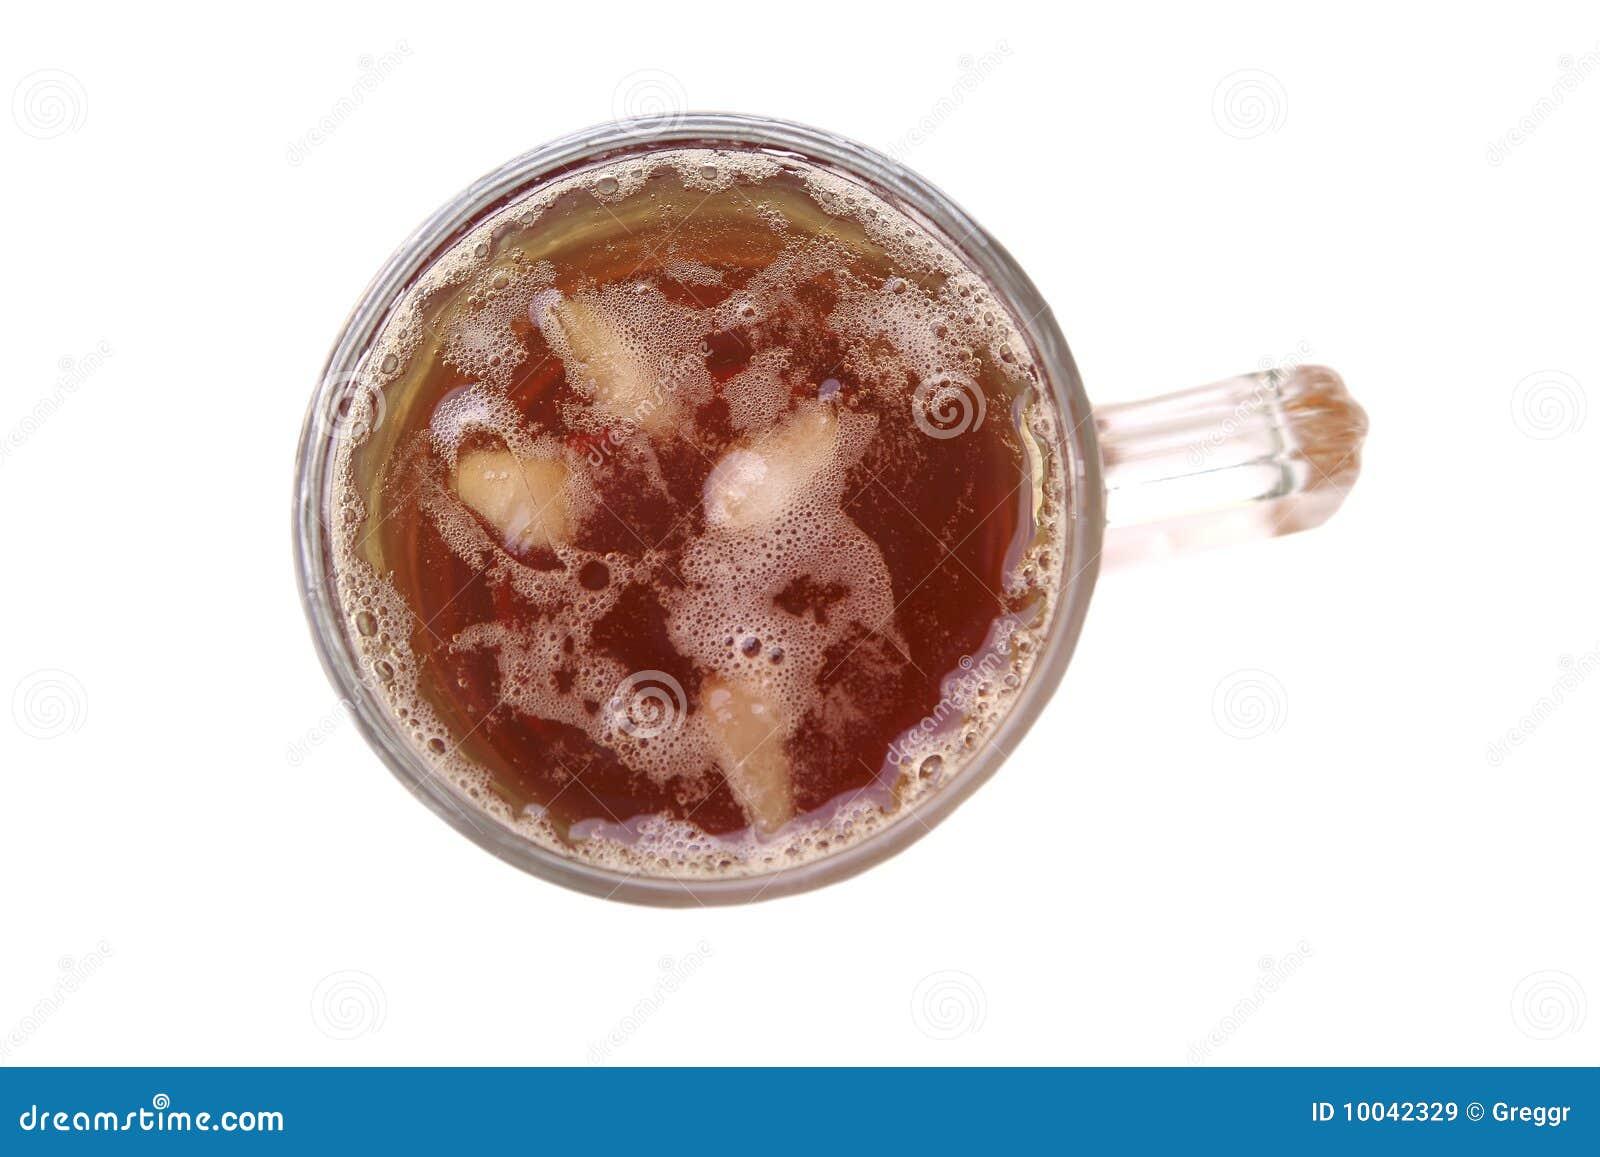 Apple juice inside big glass